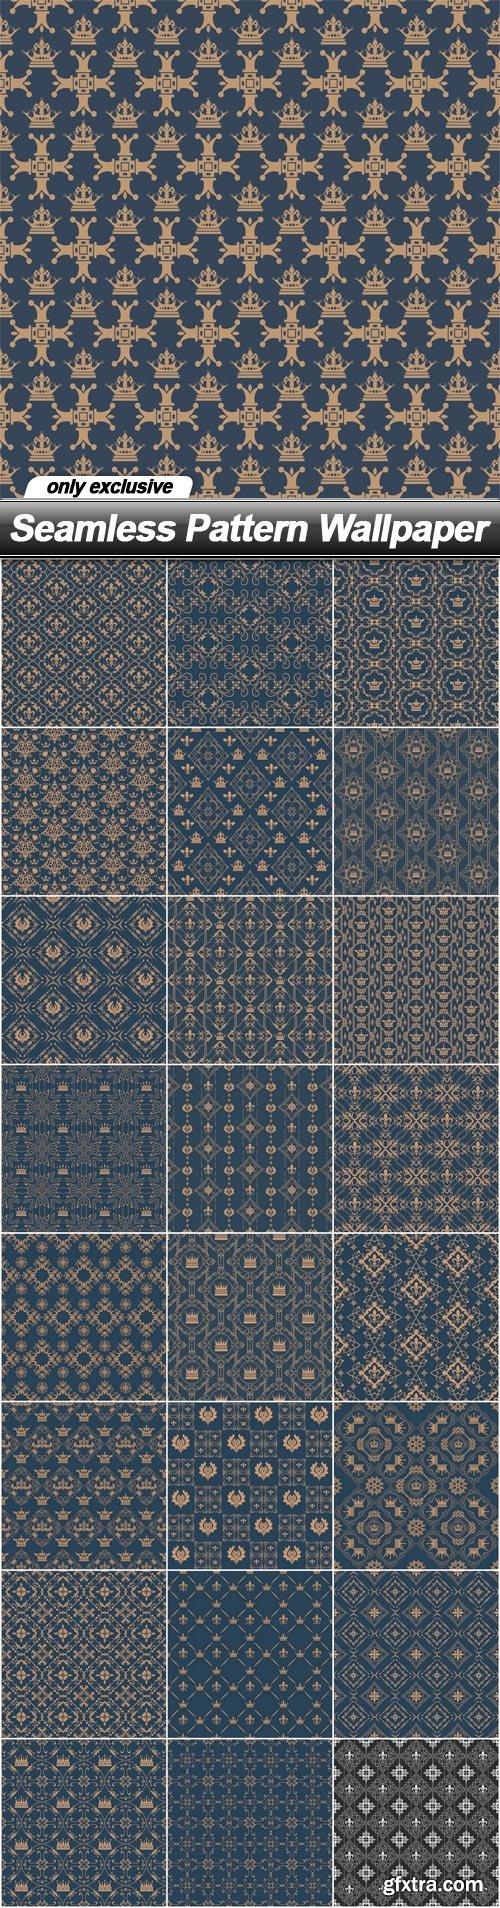 Seamless Pattern Wallpaper - 25 EPS